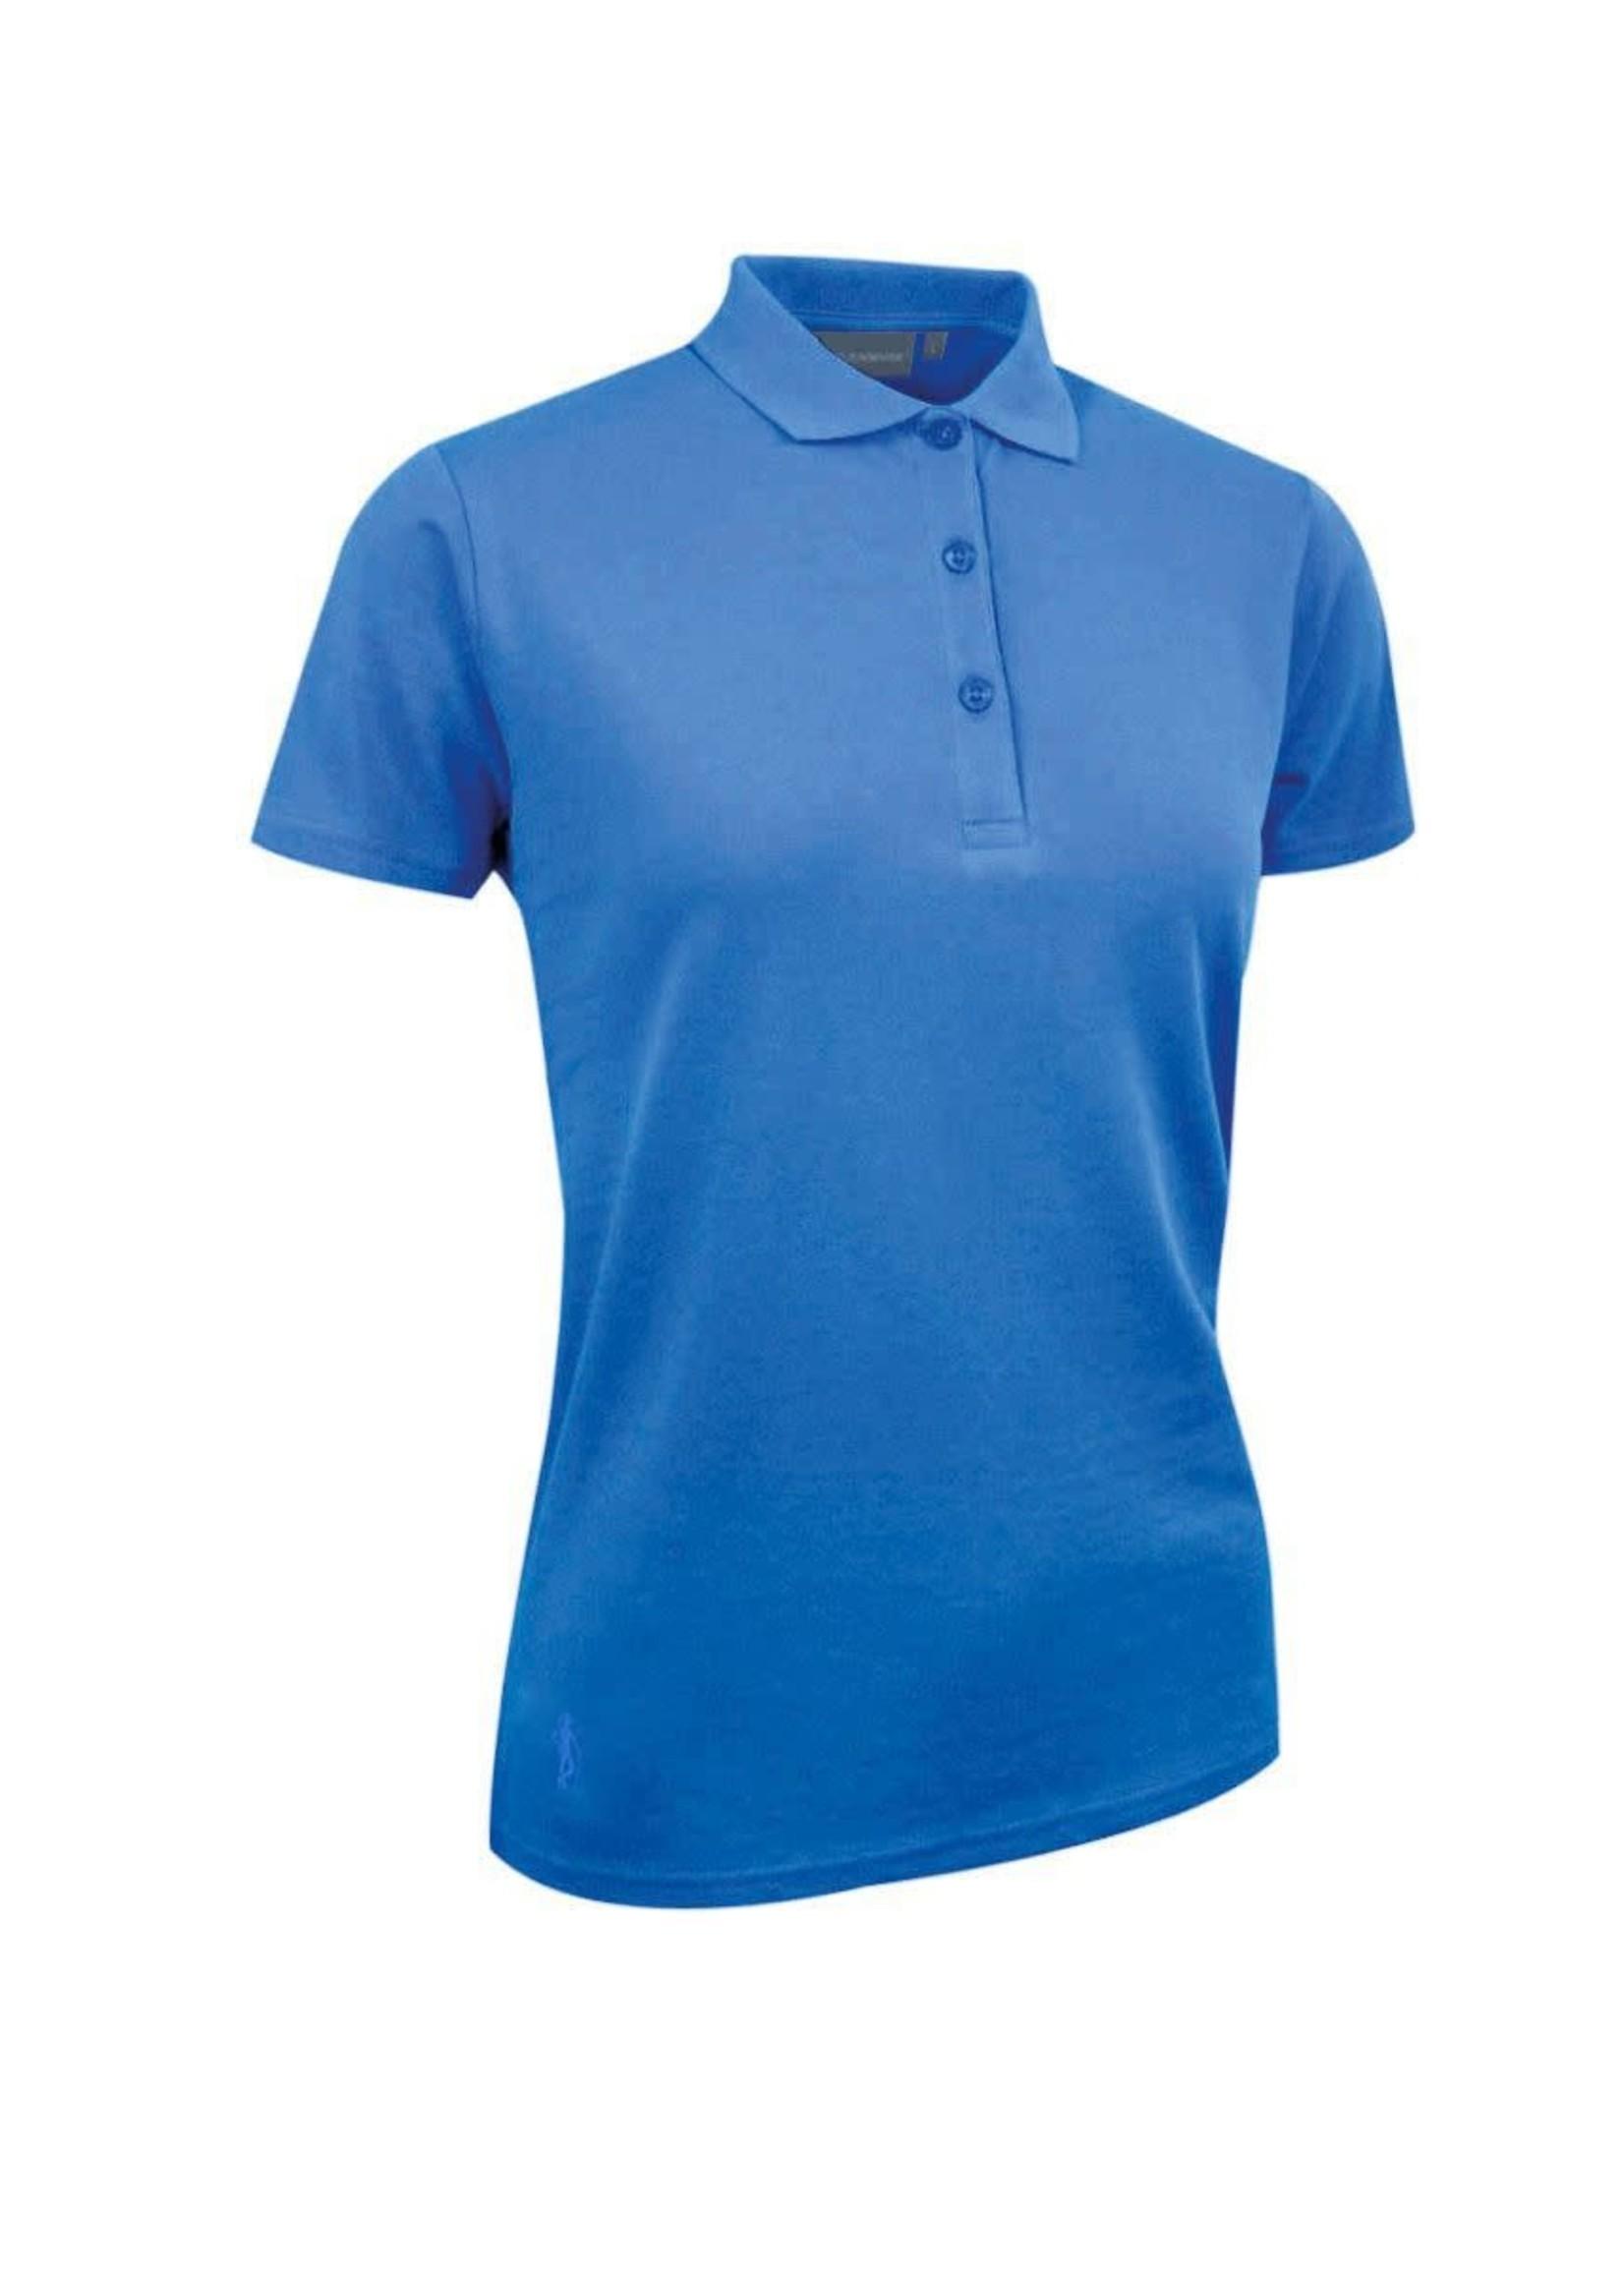 Glenmuir Glenmuir Sophie Ladies Cotton Polo Shirt